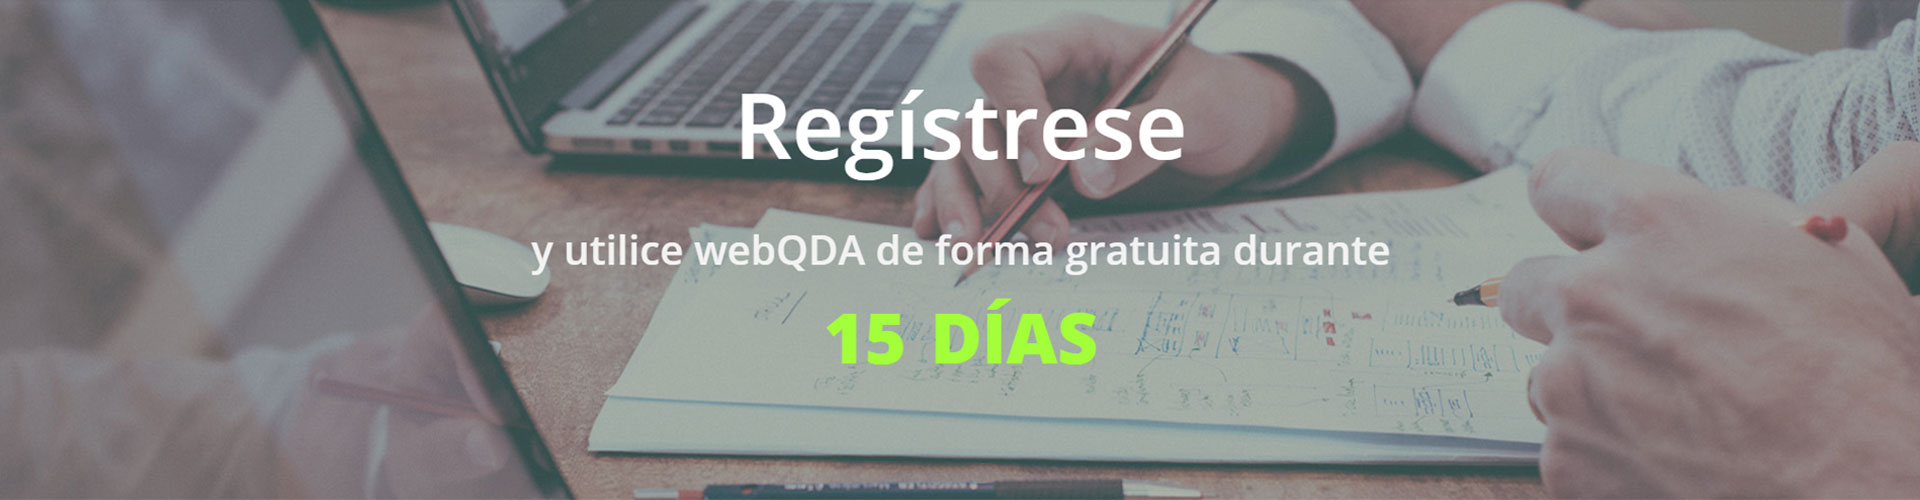 Registro webQDA